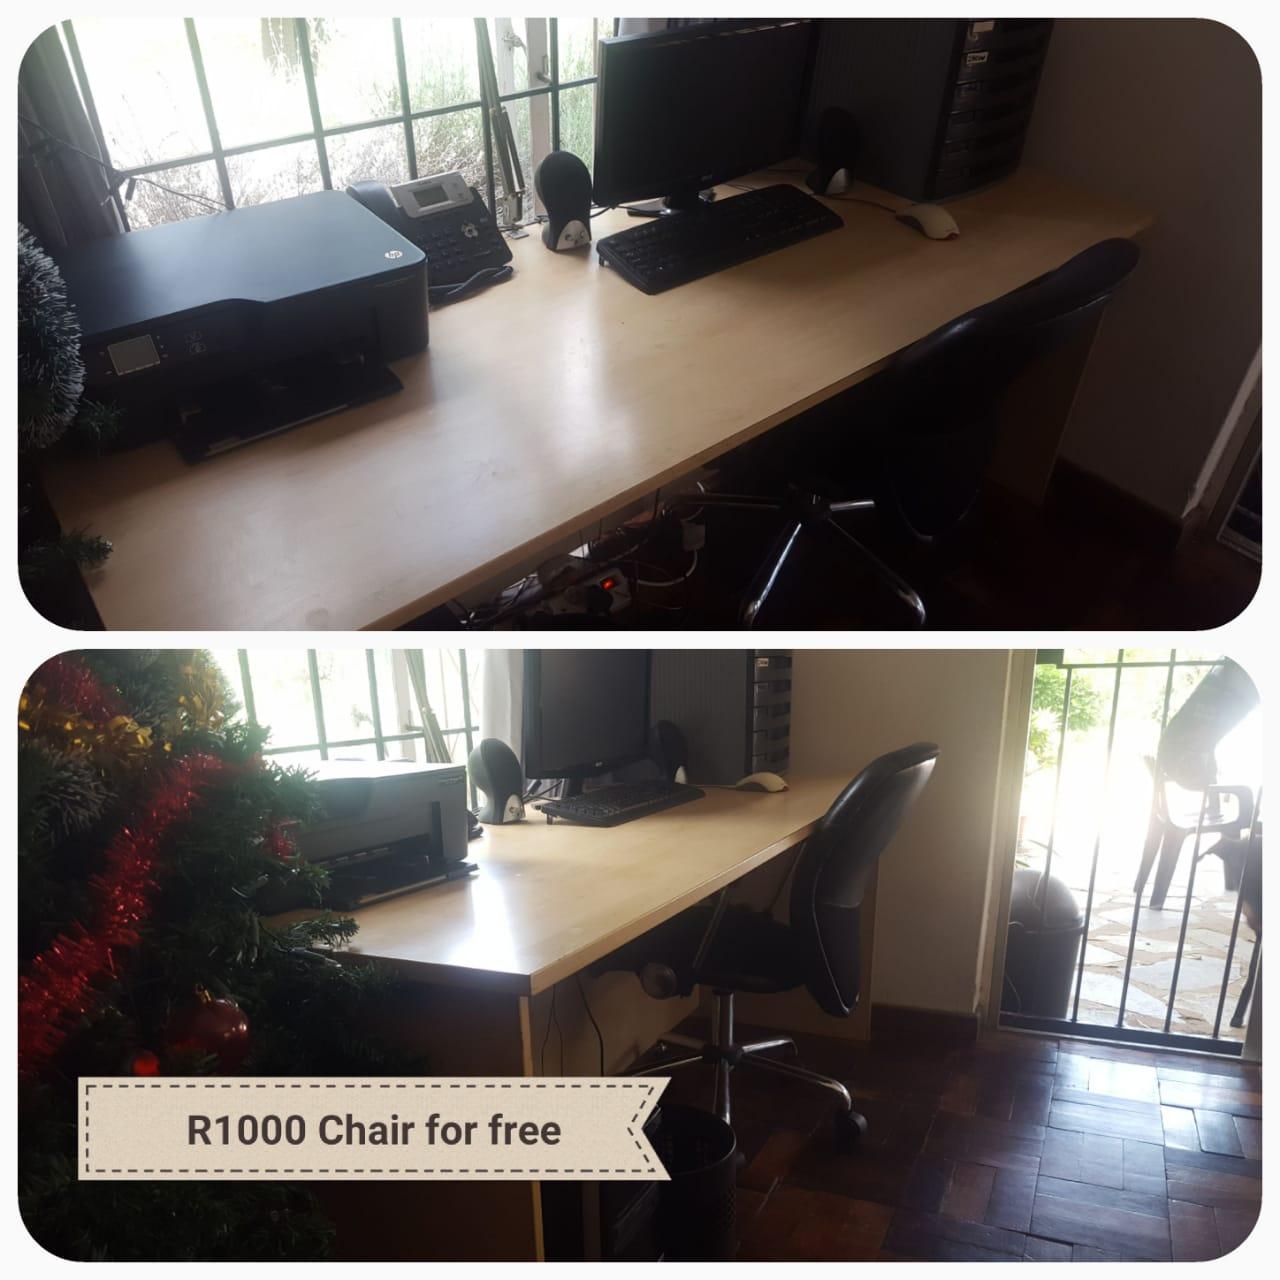 Medium size desk